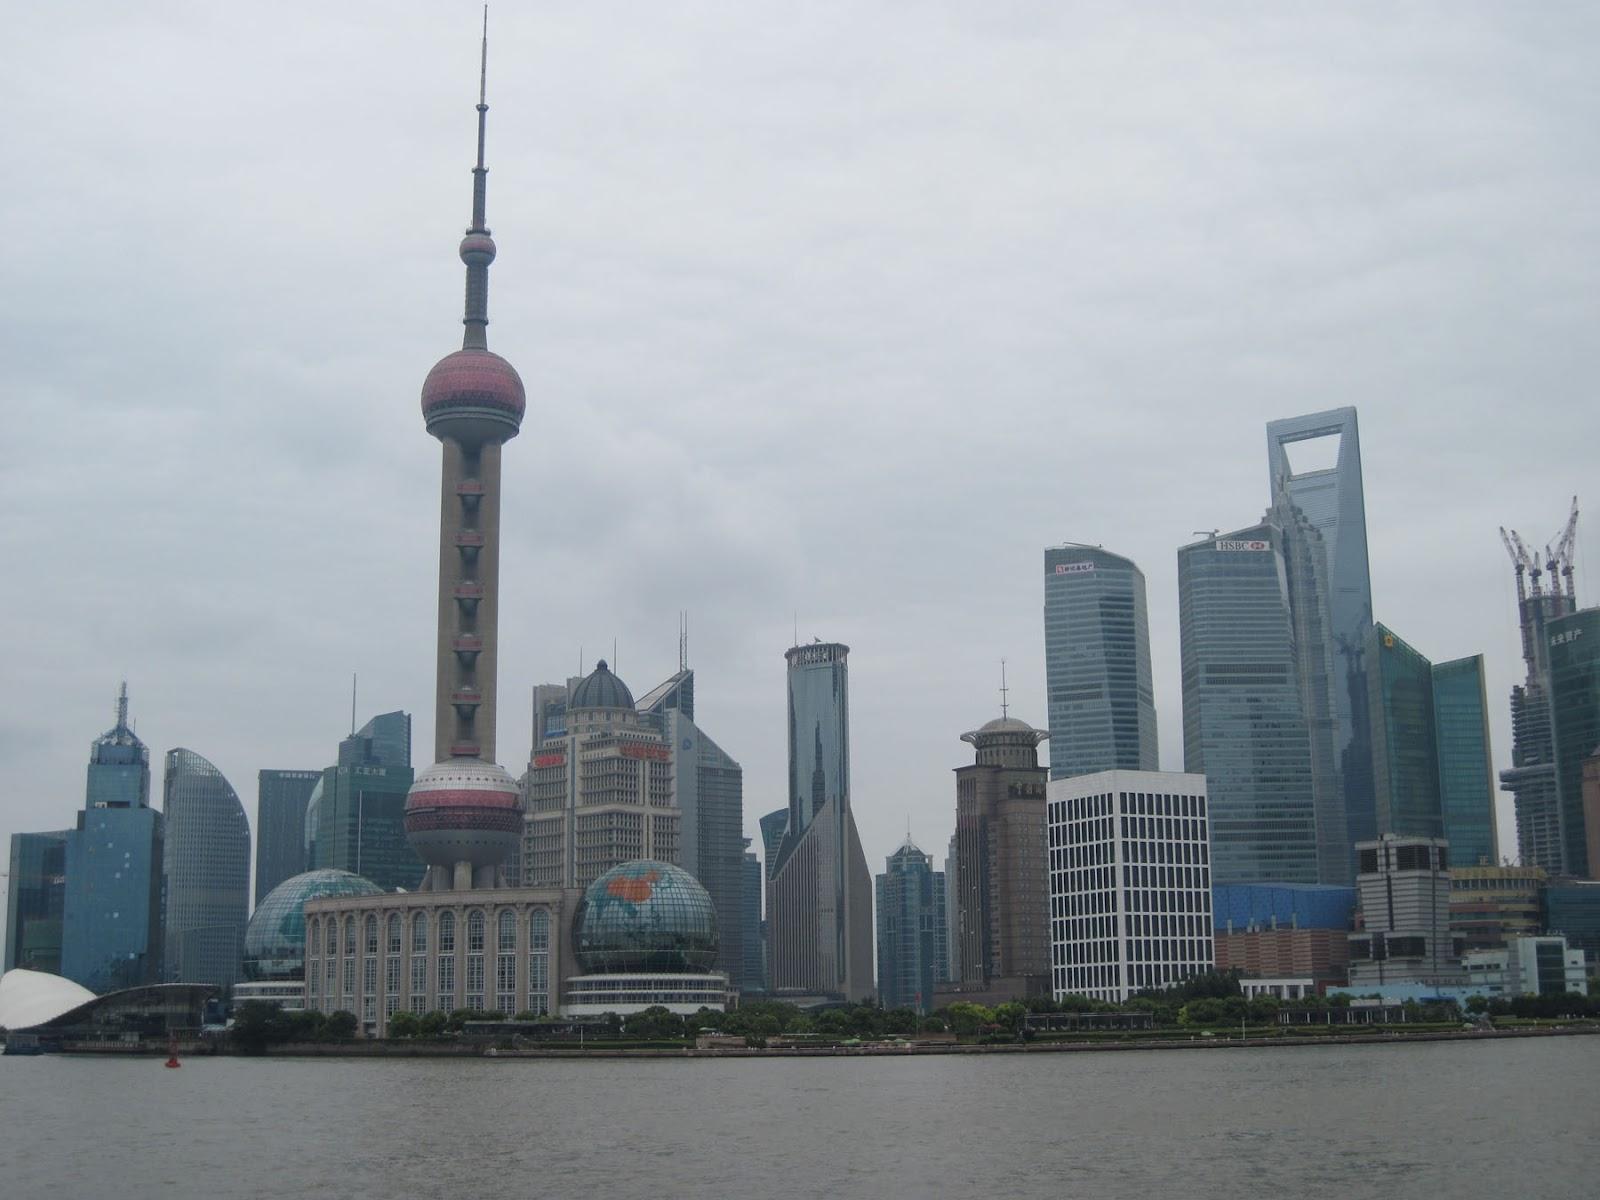 http://1.bp.blogspot.com/-wOCGwQFlBxs/T7ypa5nay_I/AAAAAAAACs0/6Srin2bW3Ns/s1600/Shanghai+City+1.jpg